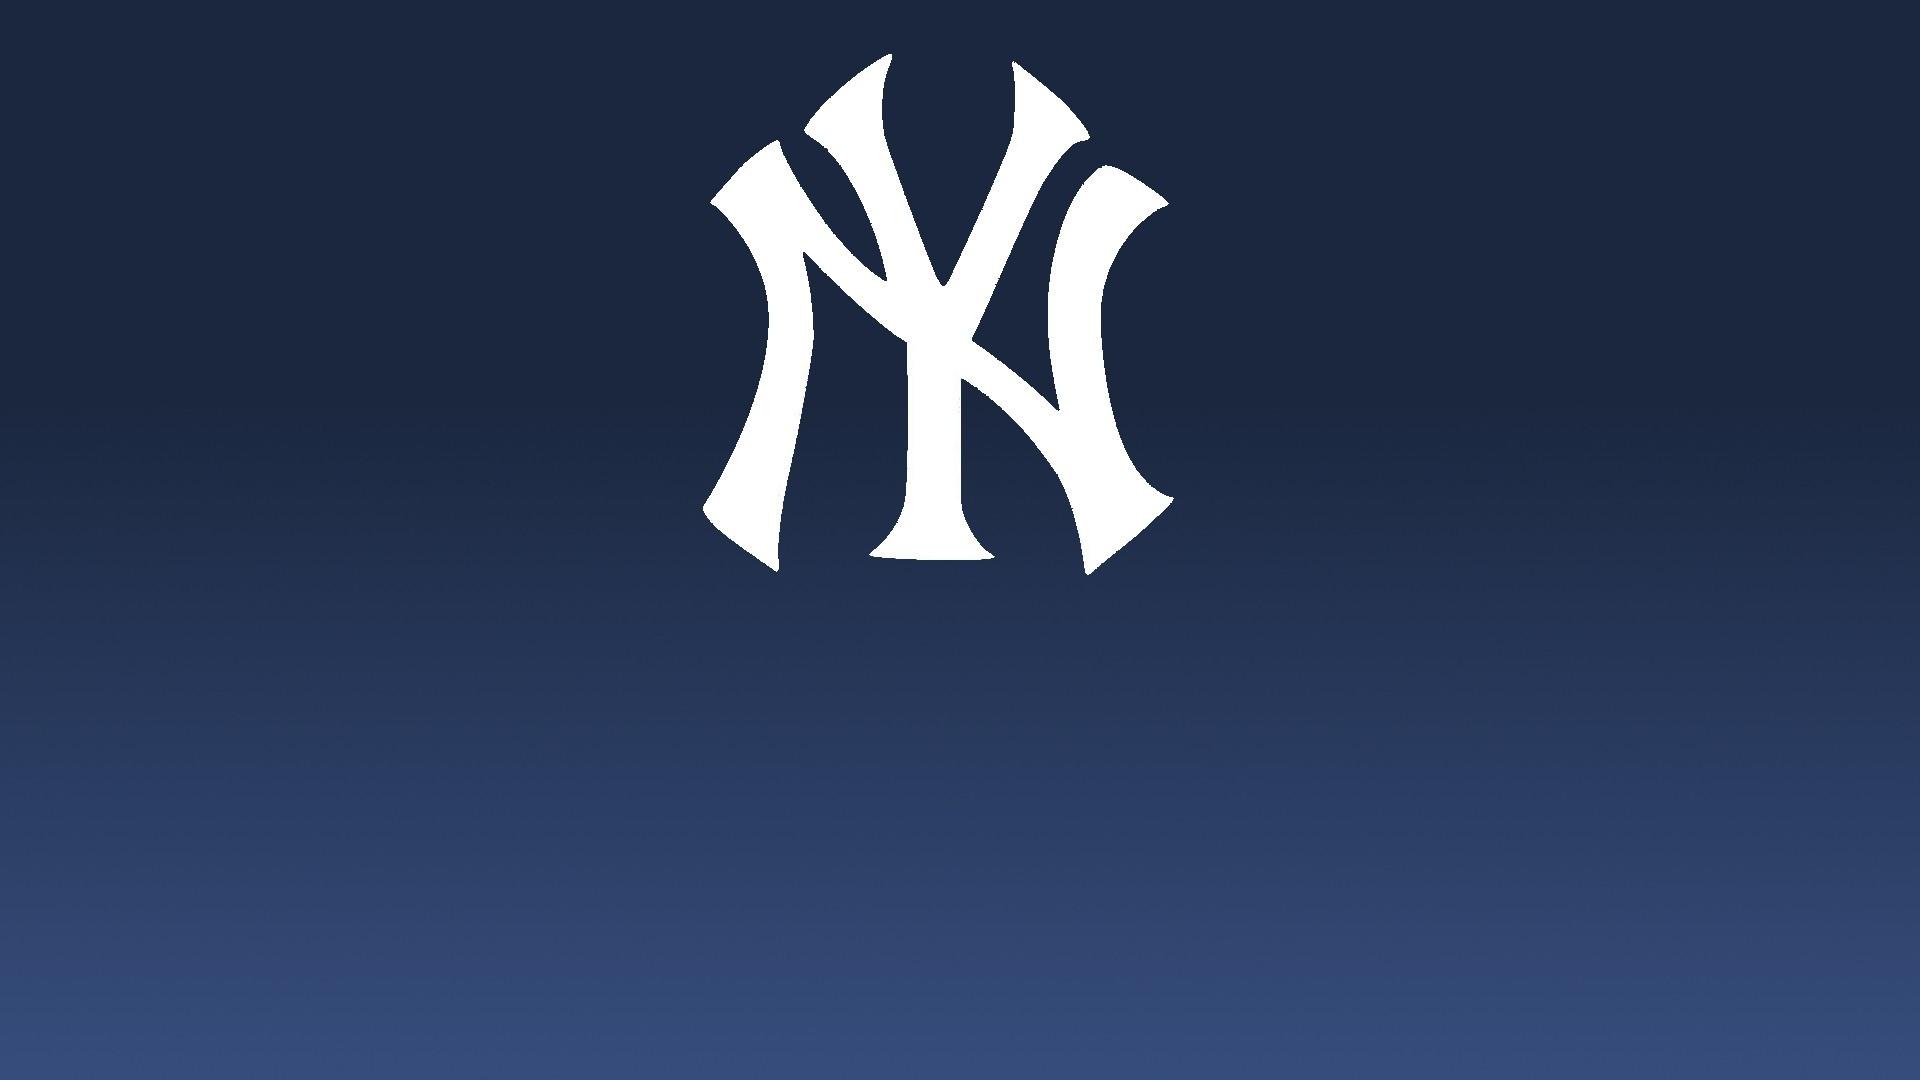 17 HD Yankees Desktop Wallpapers For Free Download. widescreen